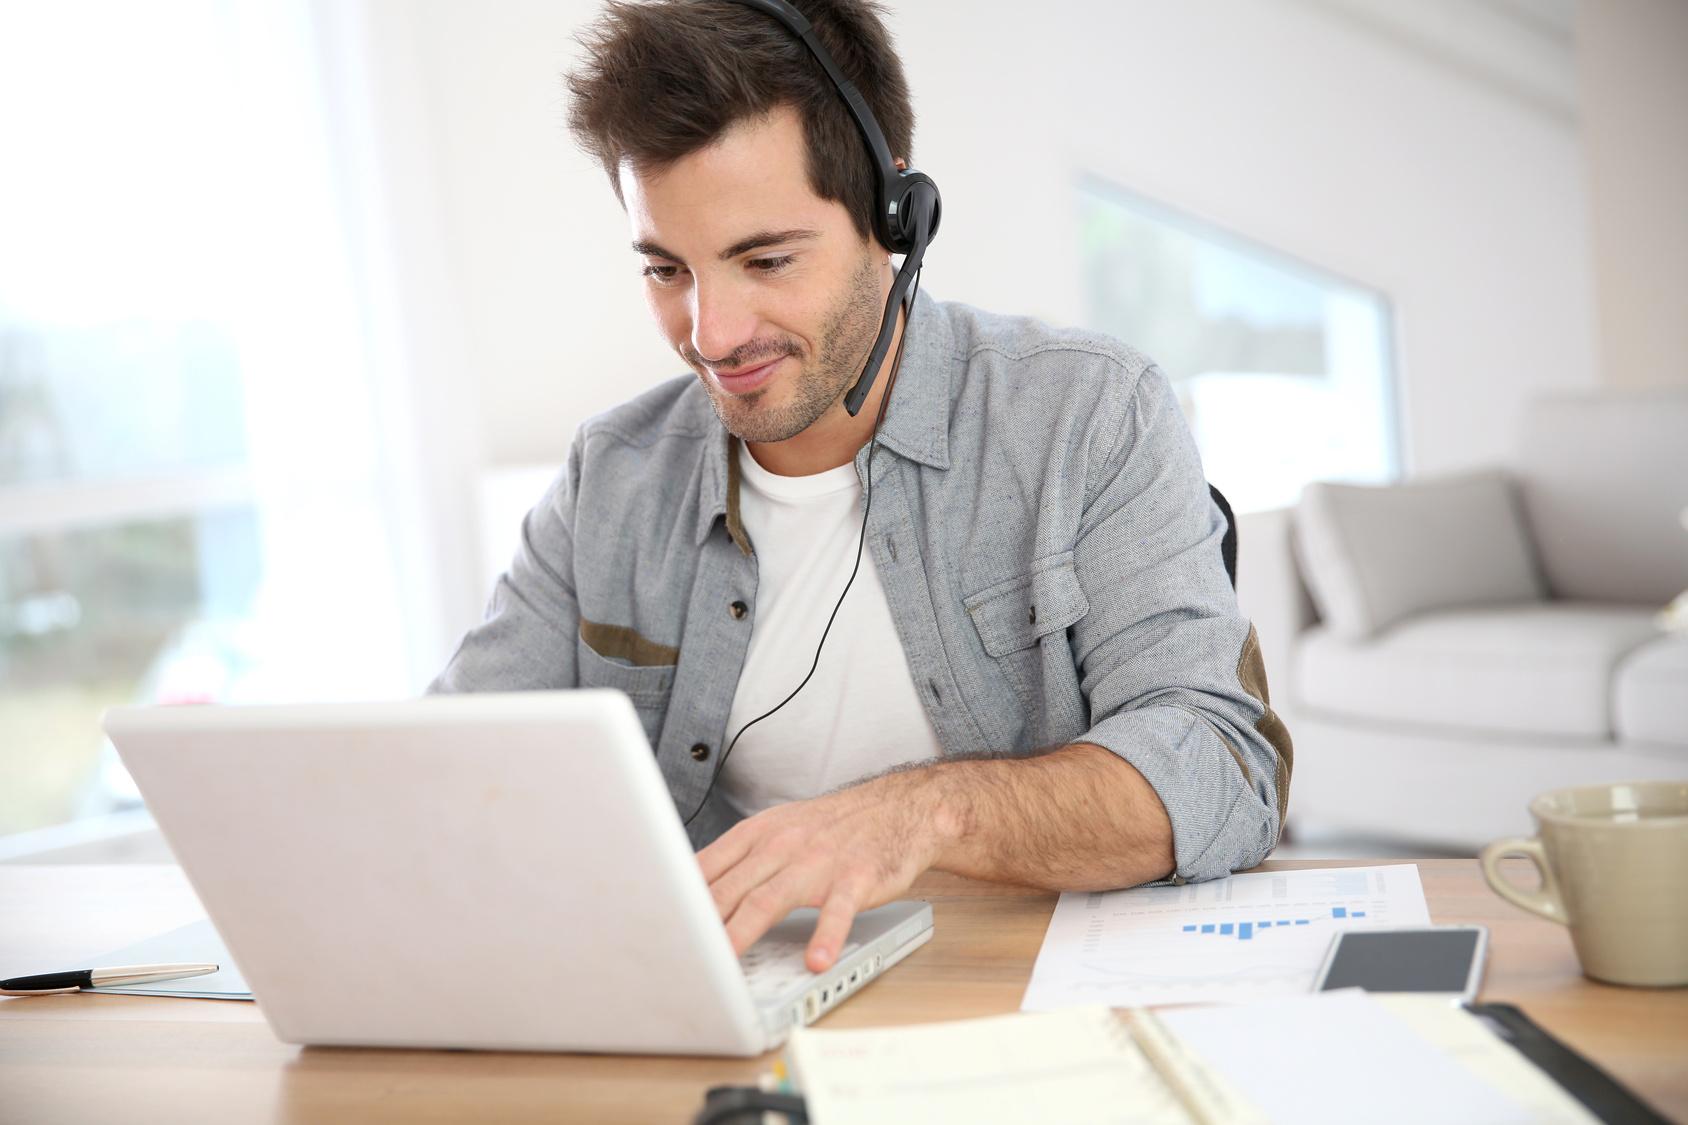 razvivat-navyki-bystro-lesson-online